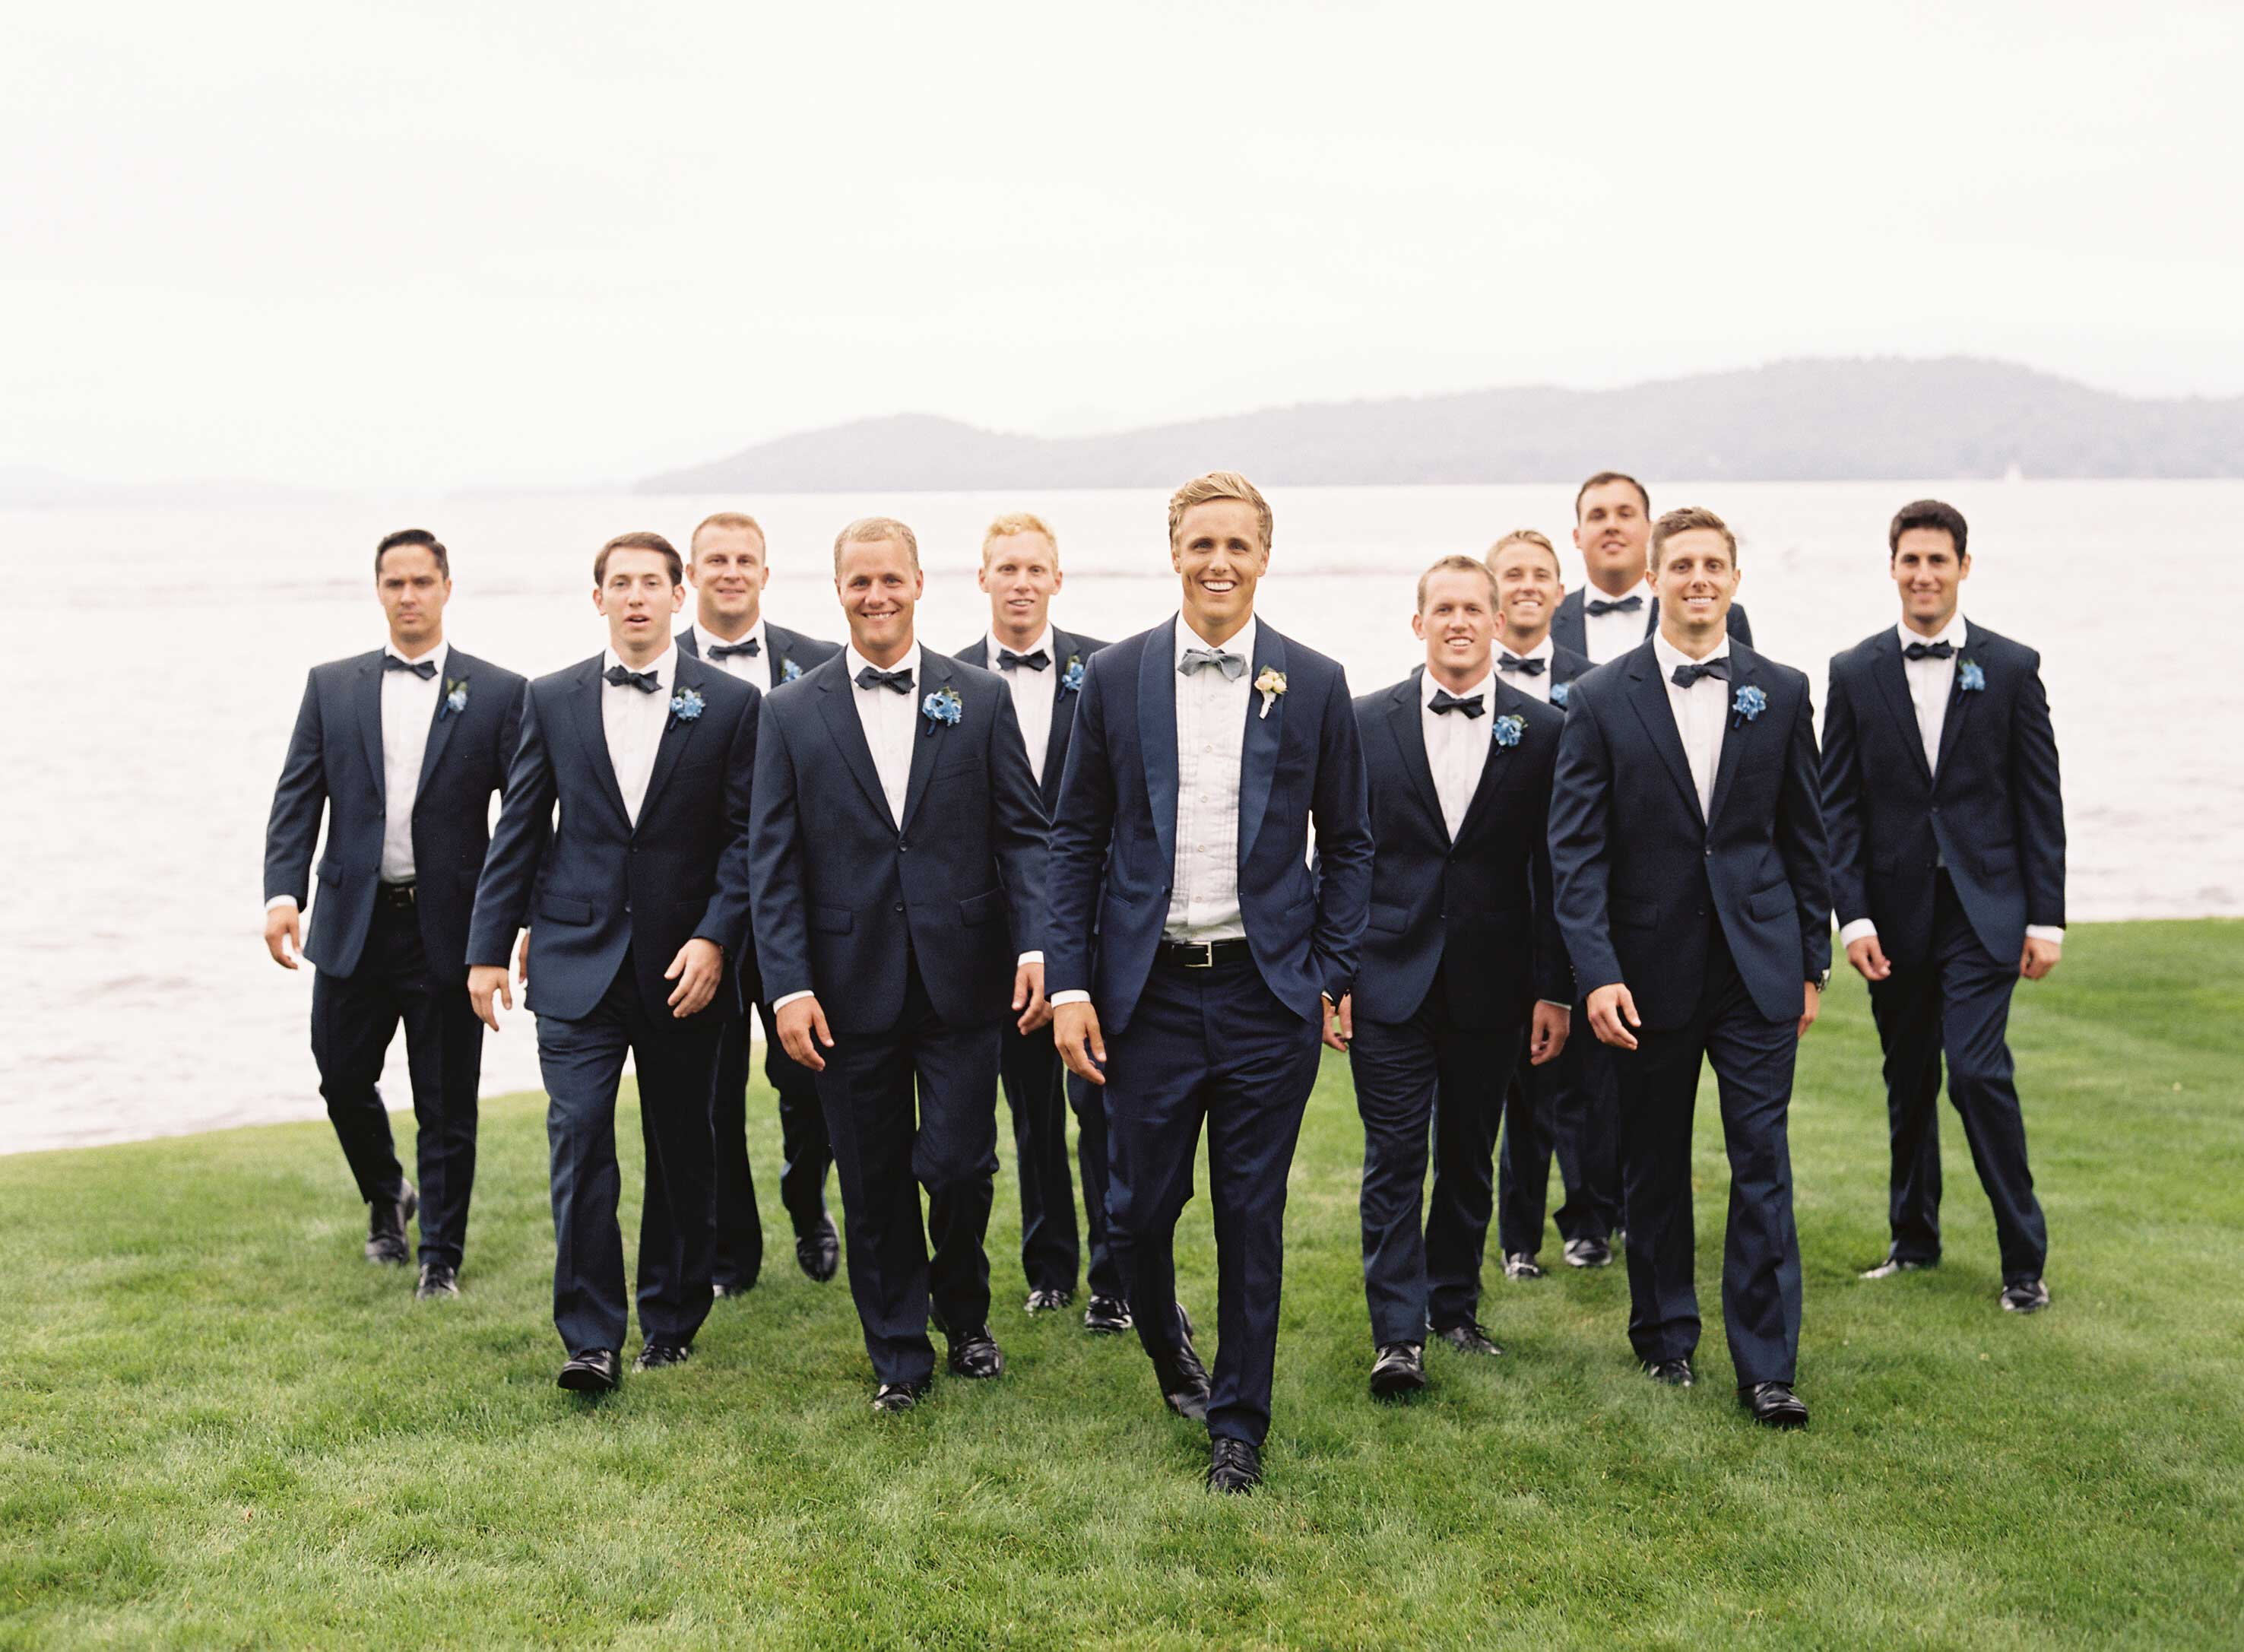 groom wedding, difference between tuxedo and suit